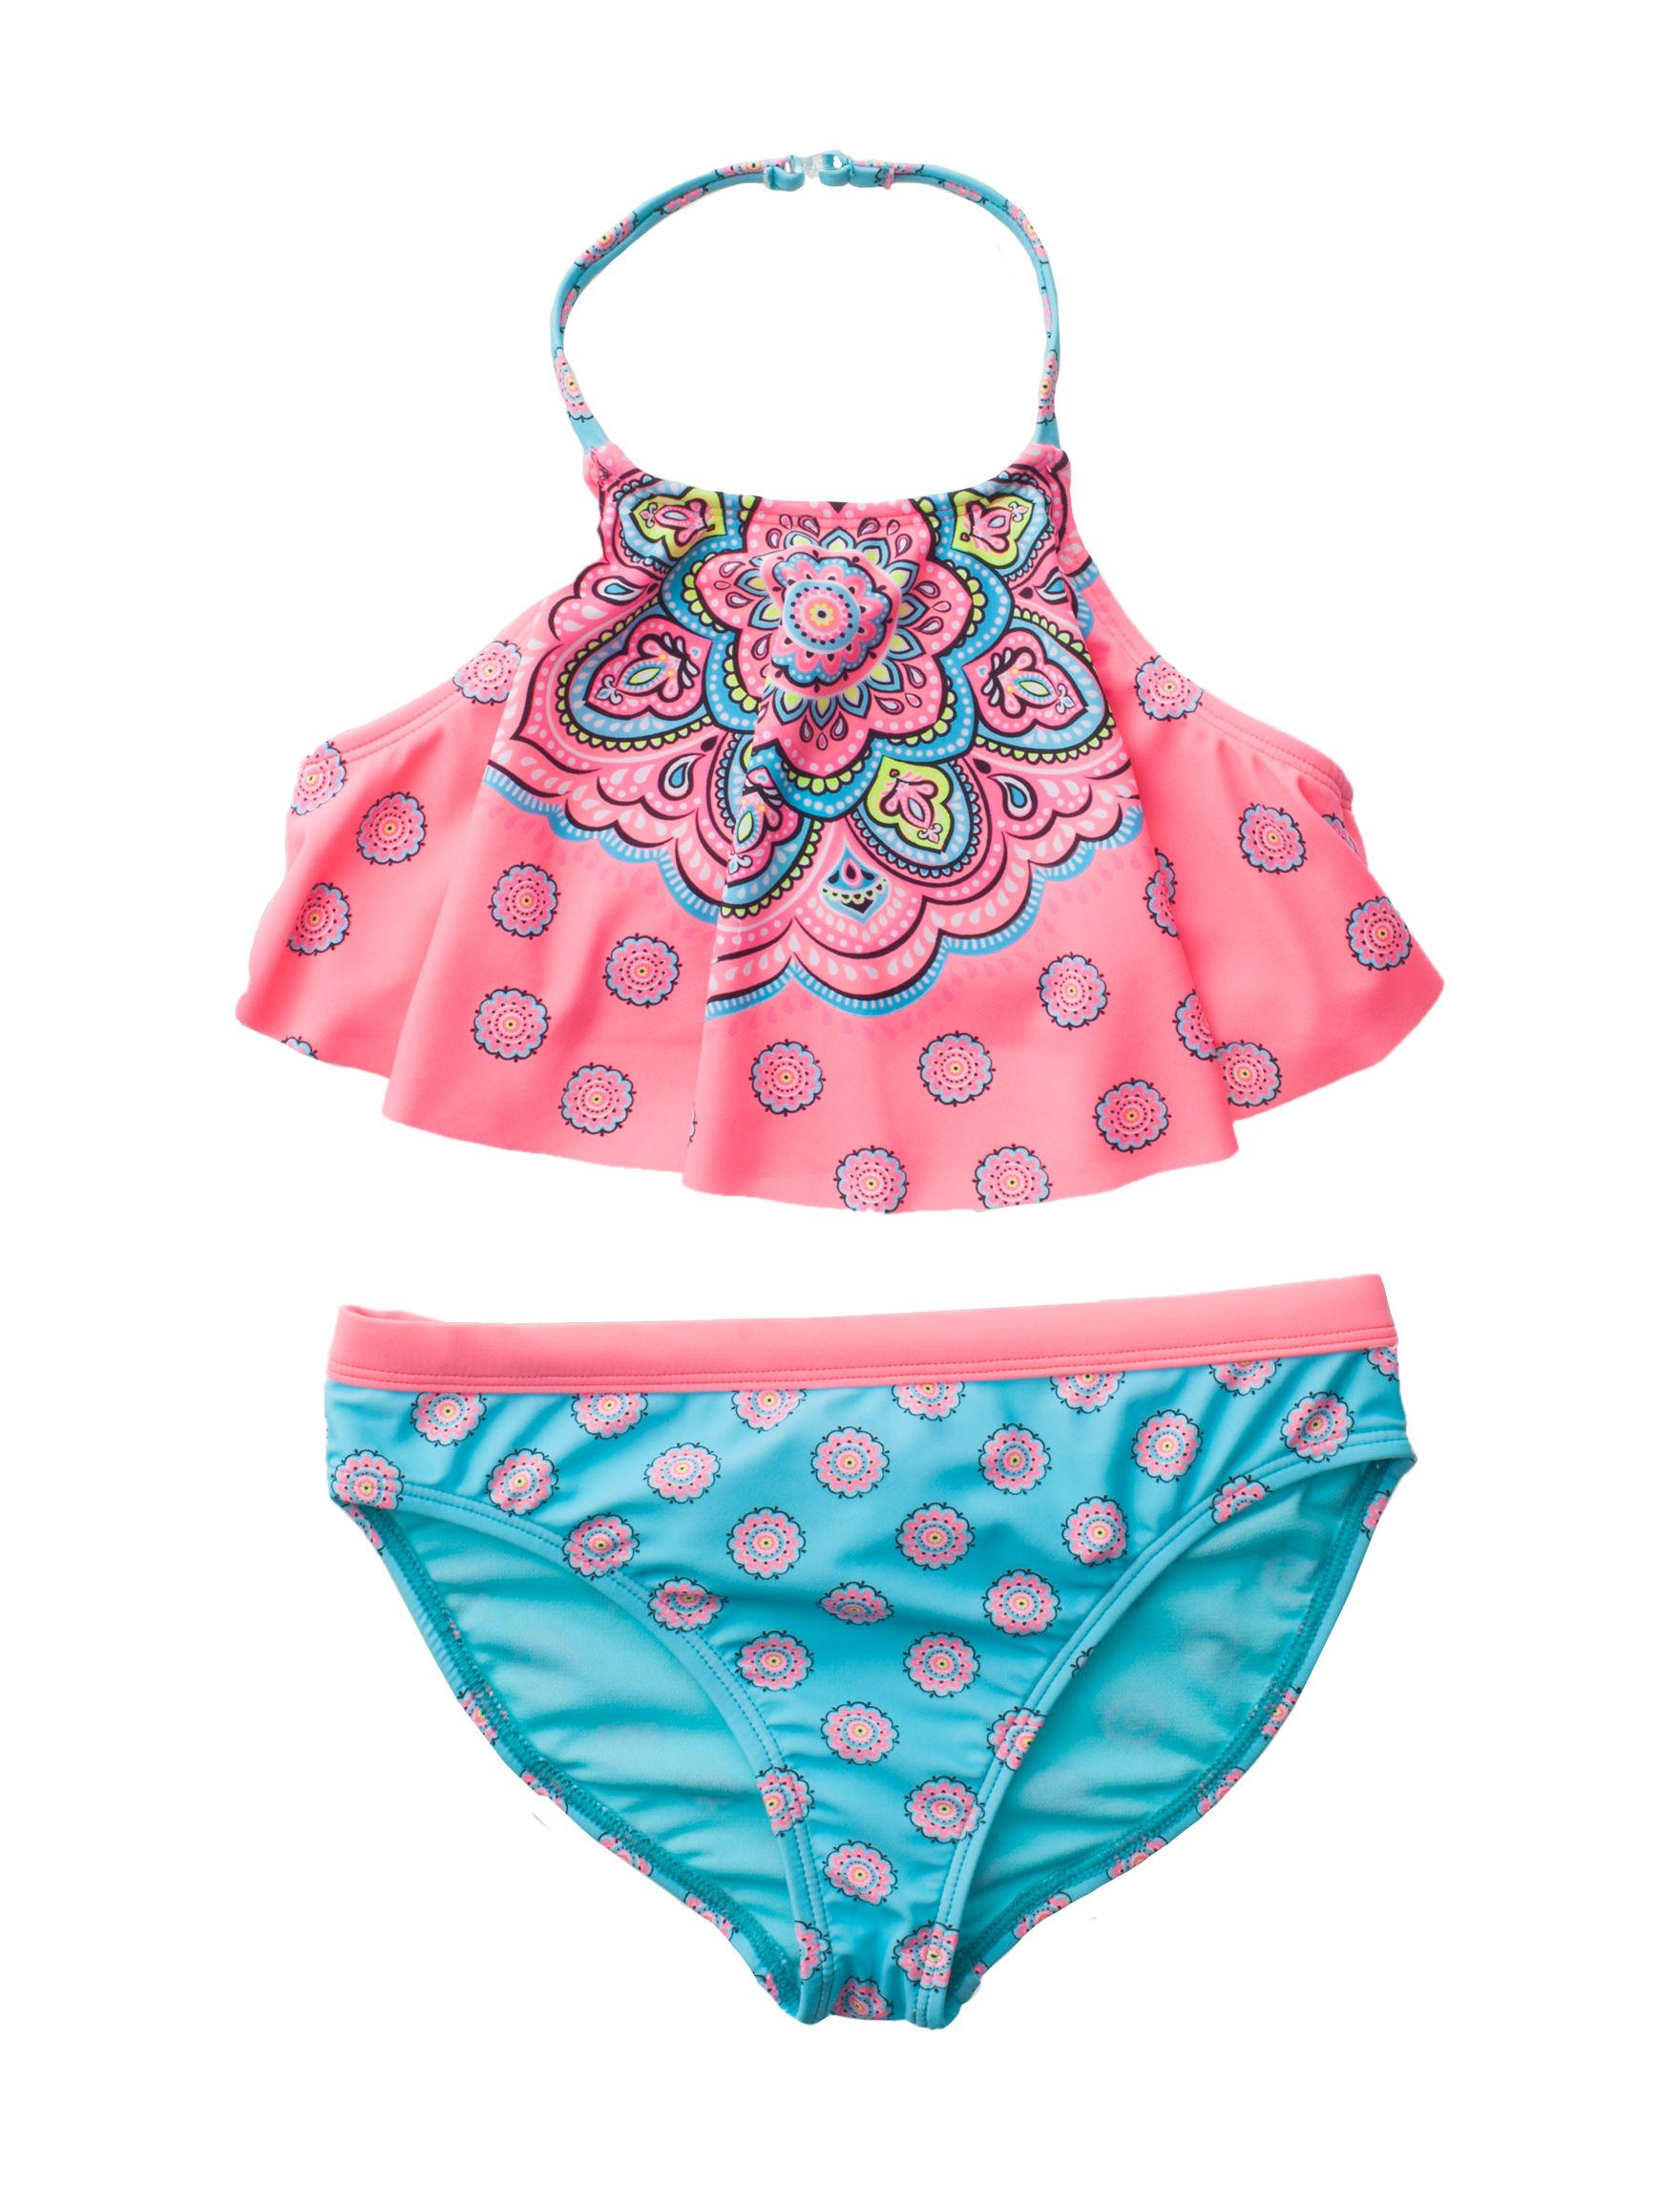 Angel Beach Pink Multi Swimsuit Bottoms Swimsuit Tops Halter